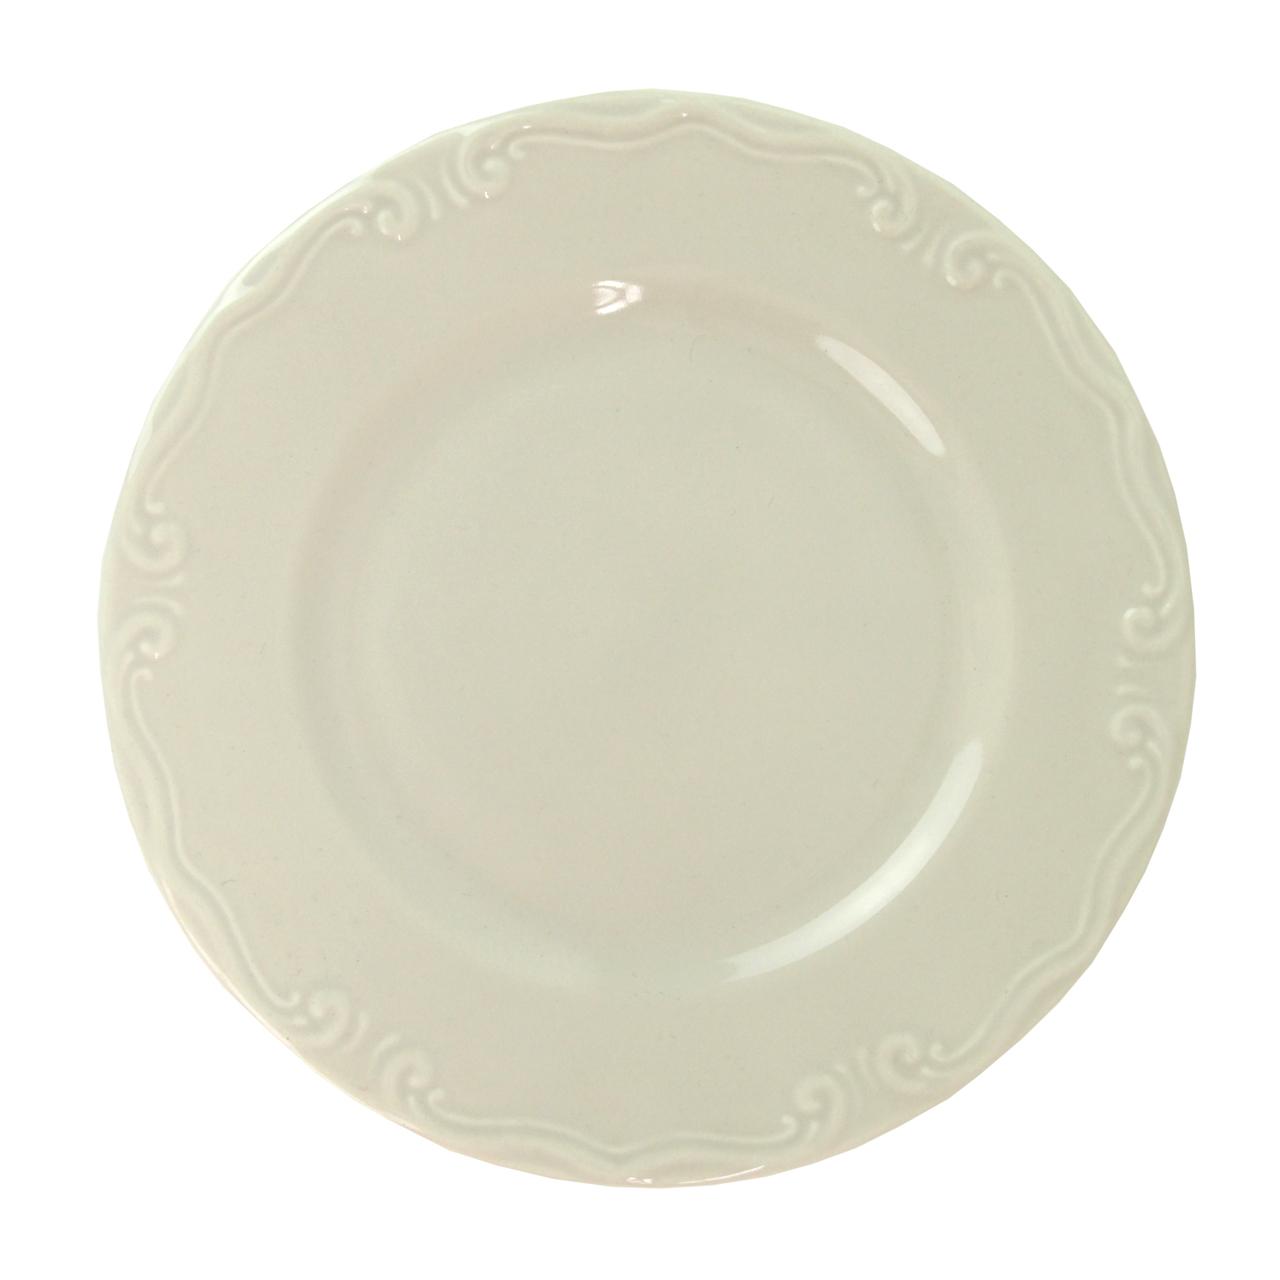 Farfurie Intinsa Royalty Din Ceramica Crem 26 Cm